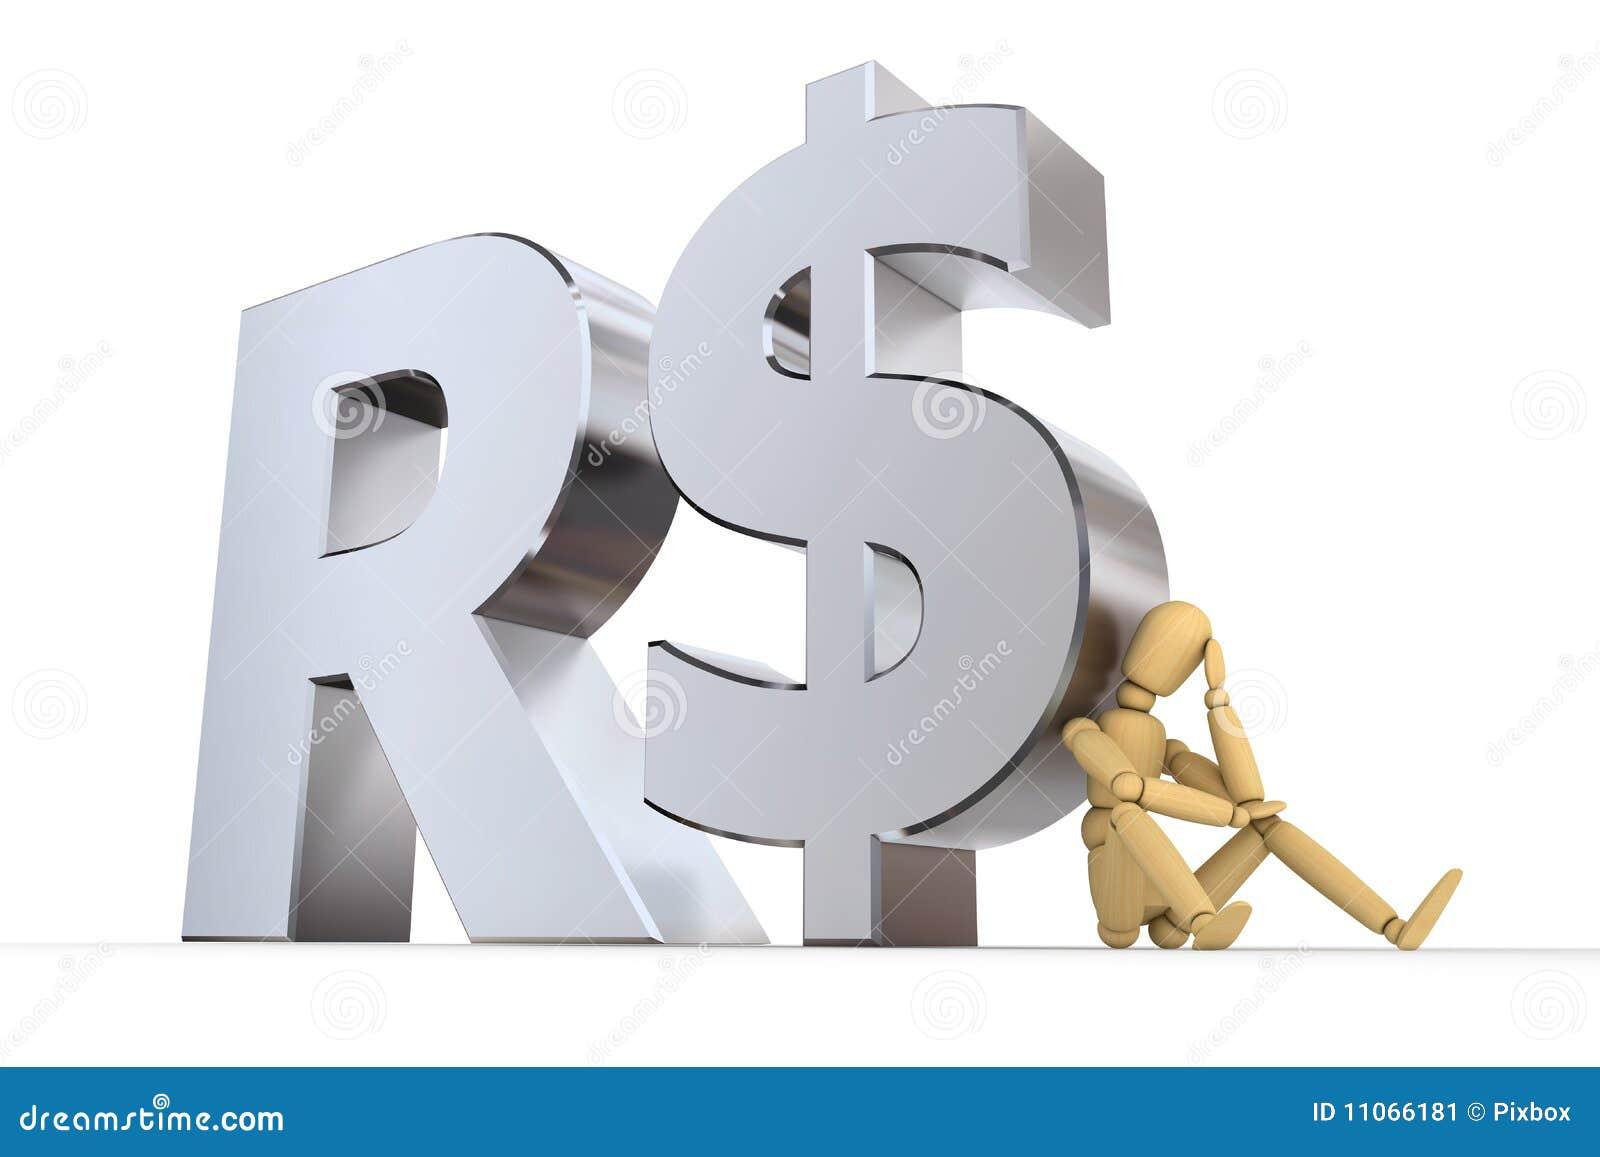 Doll at brazilian real symbol stock illustration illustration of royalty free stock photo buycottarizona Images